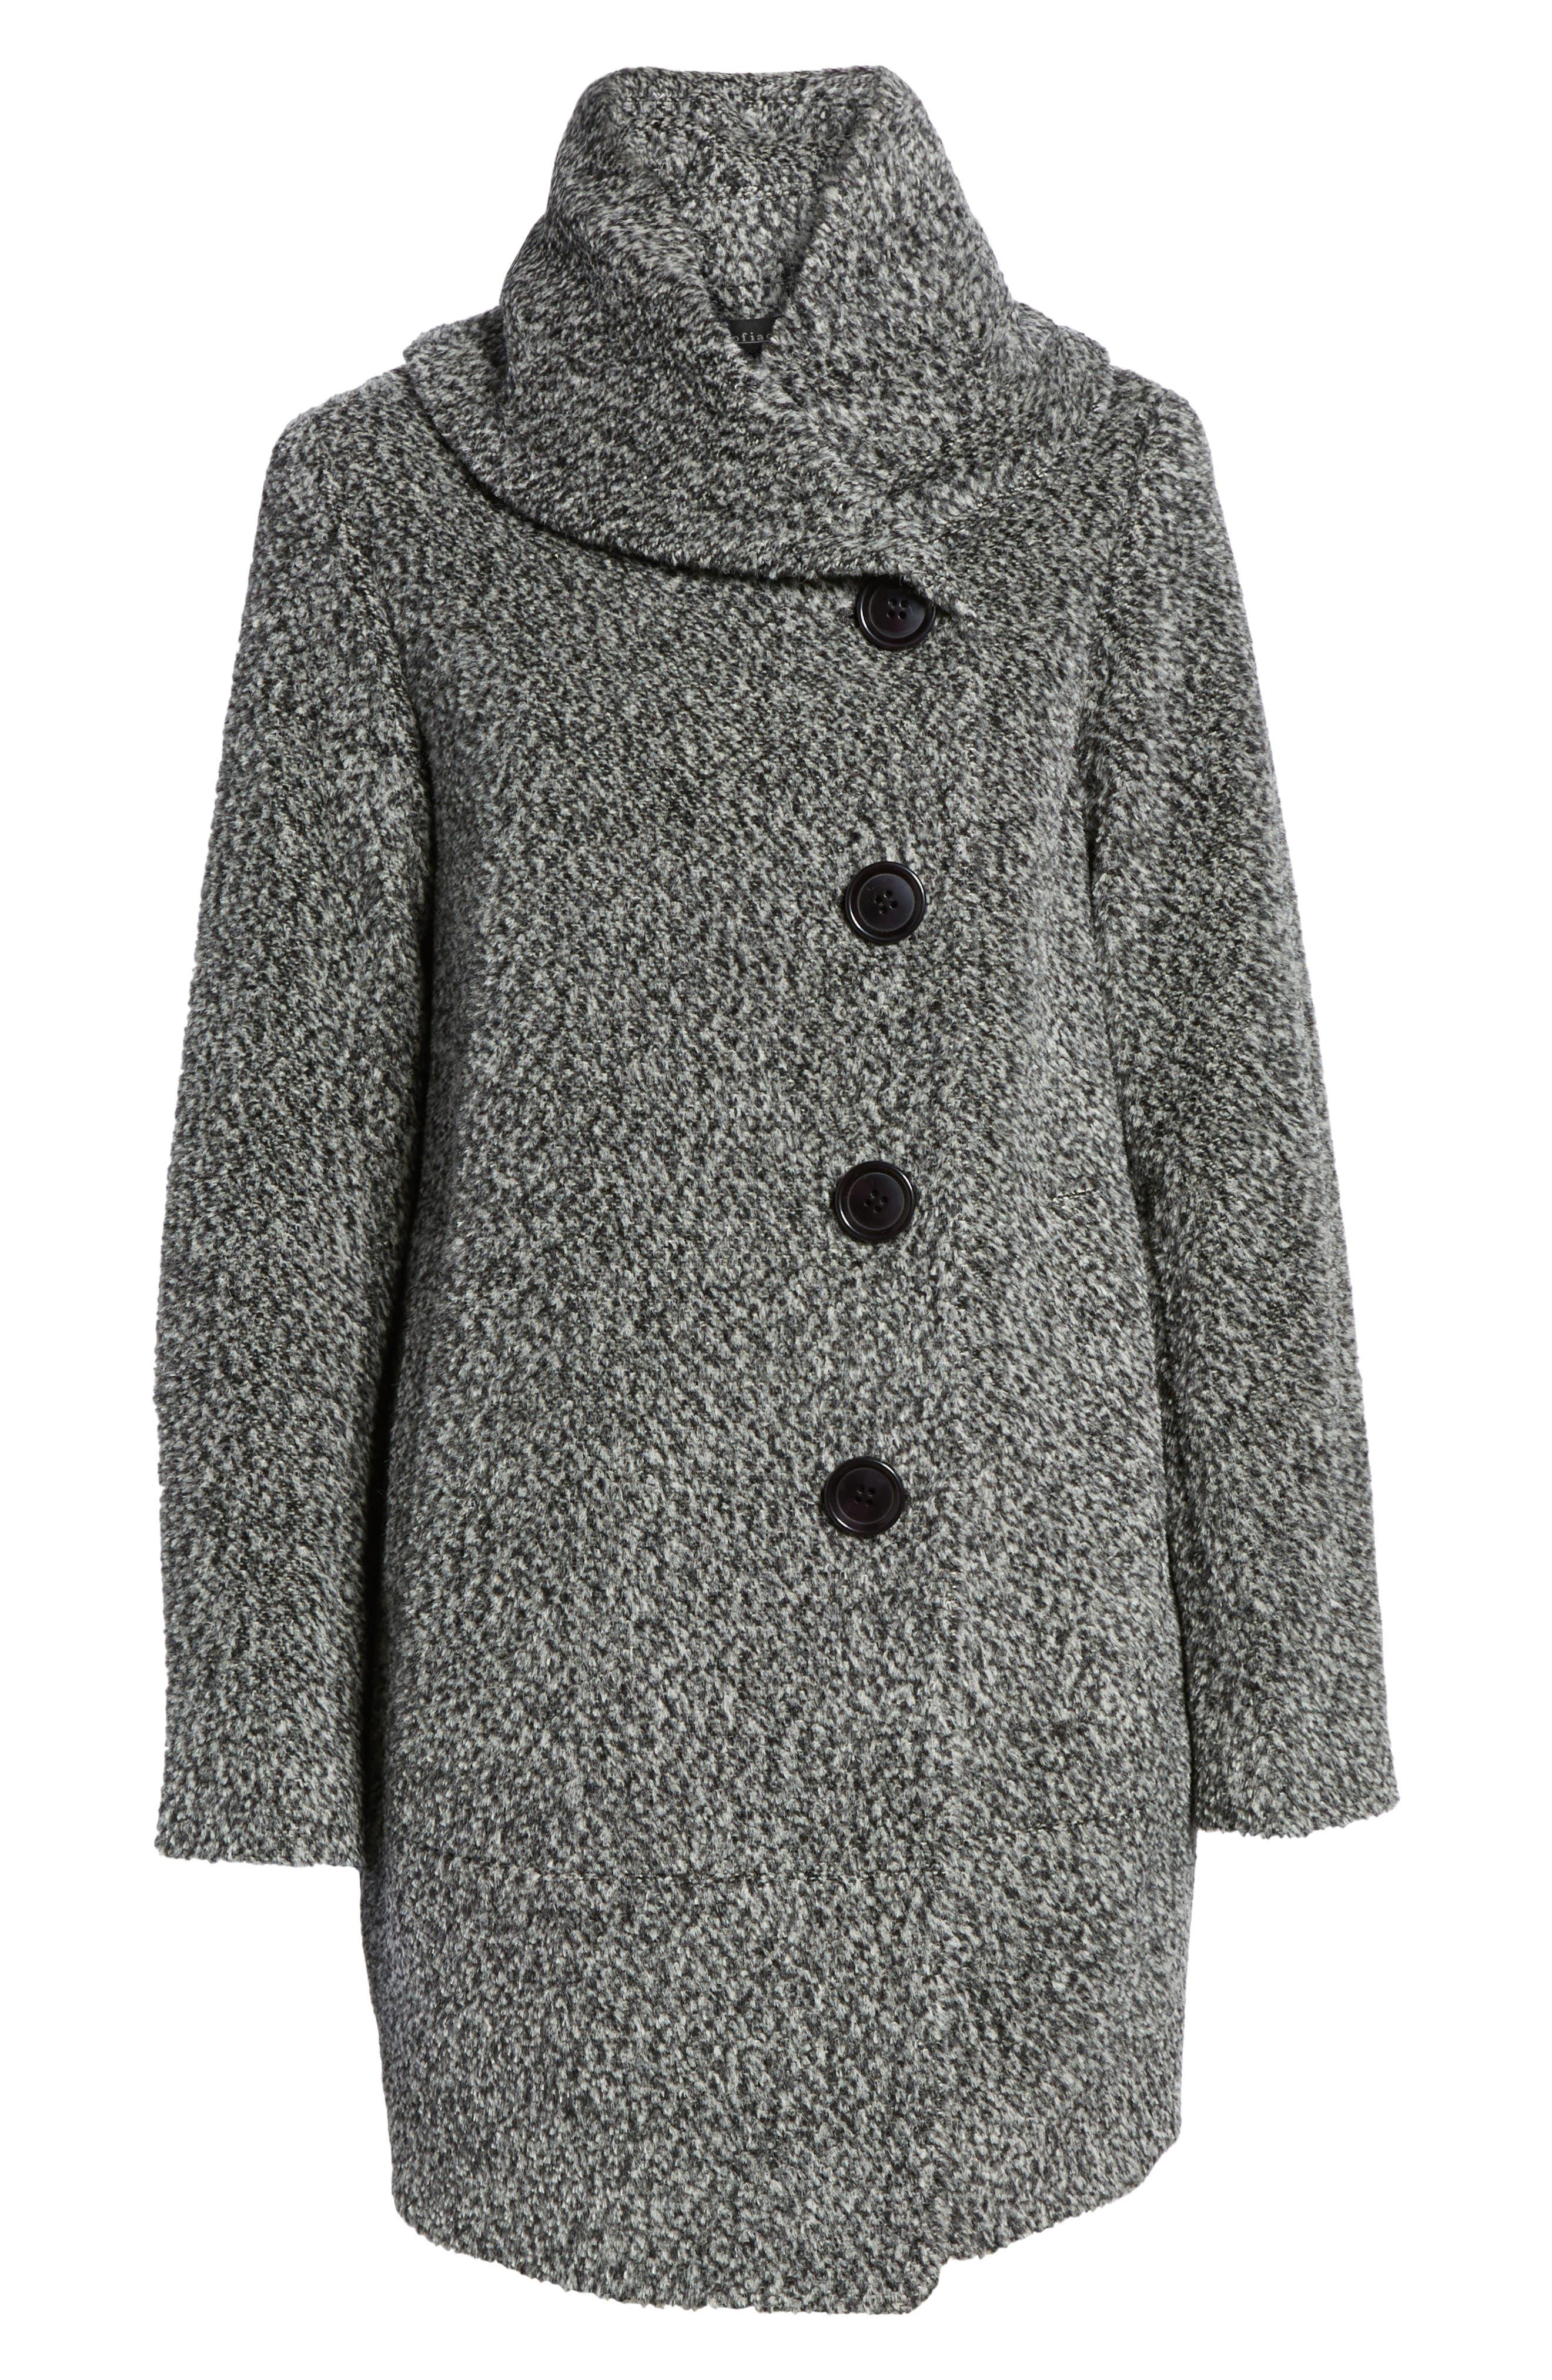 Wool Blend Coat,                             Alternate thumbnail 5, color,                             011